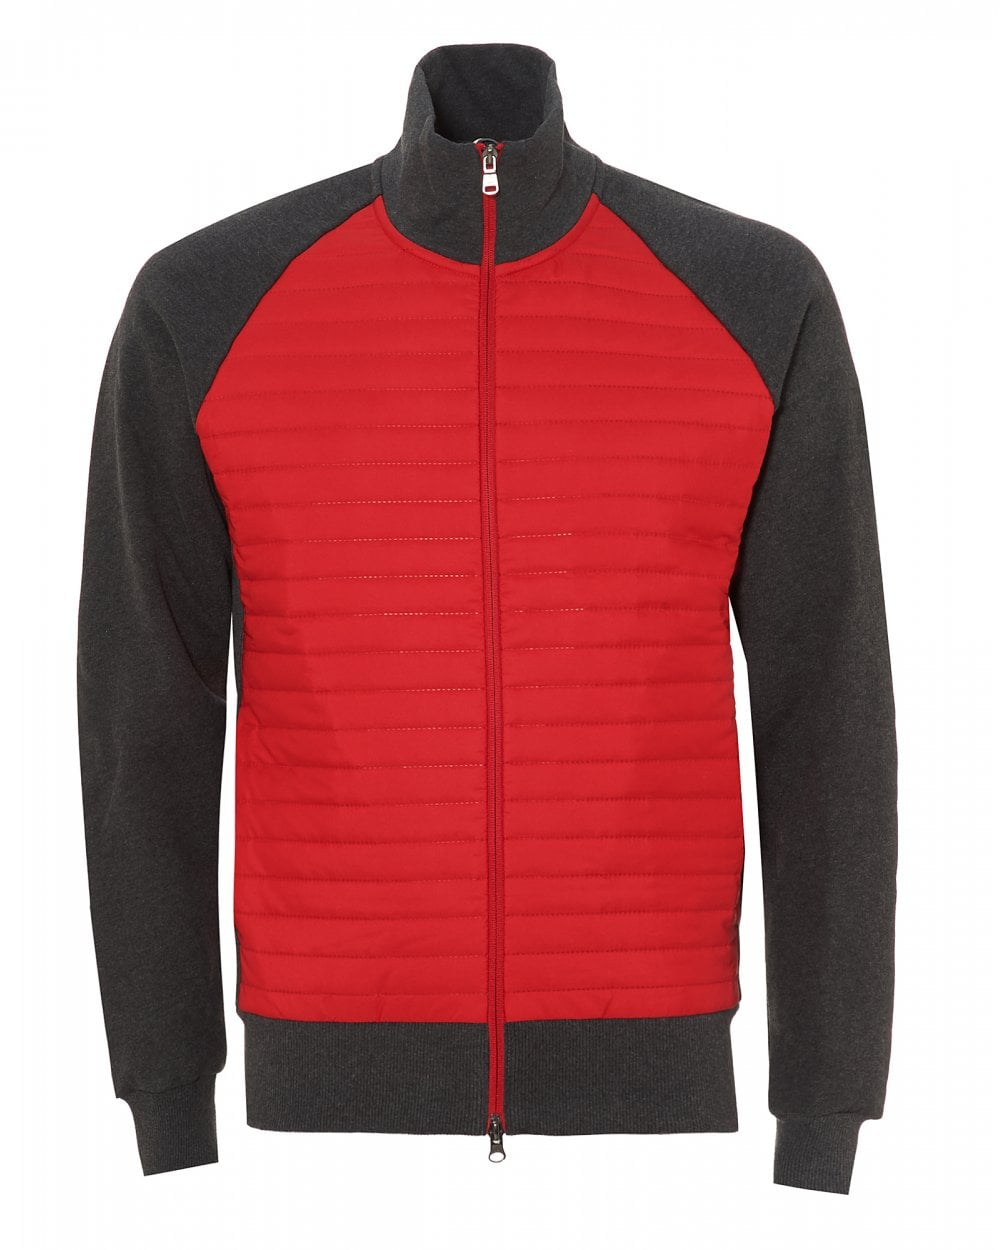 3dfc3c65c Mens Padded Sporty Sweatshirt, Red Grey Cotton Sweat